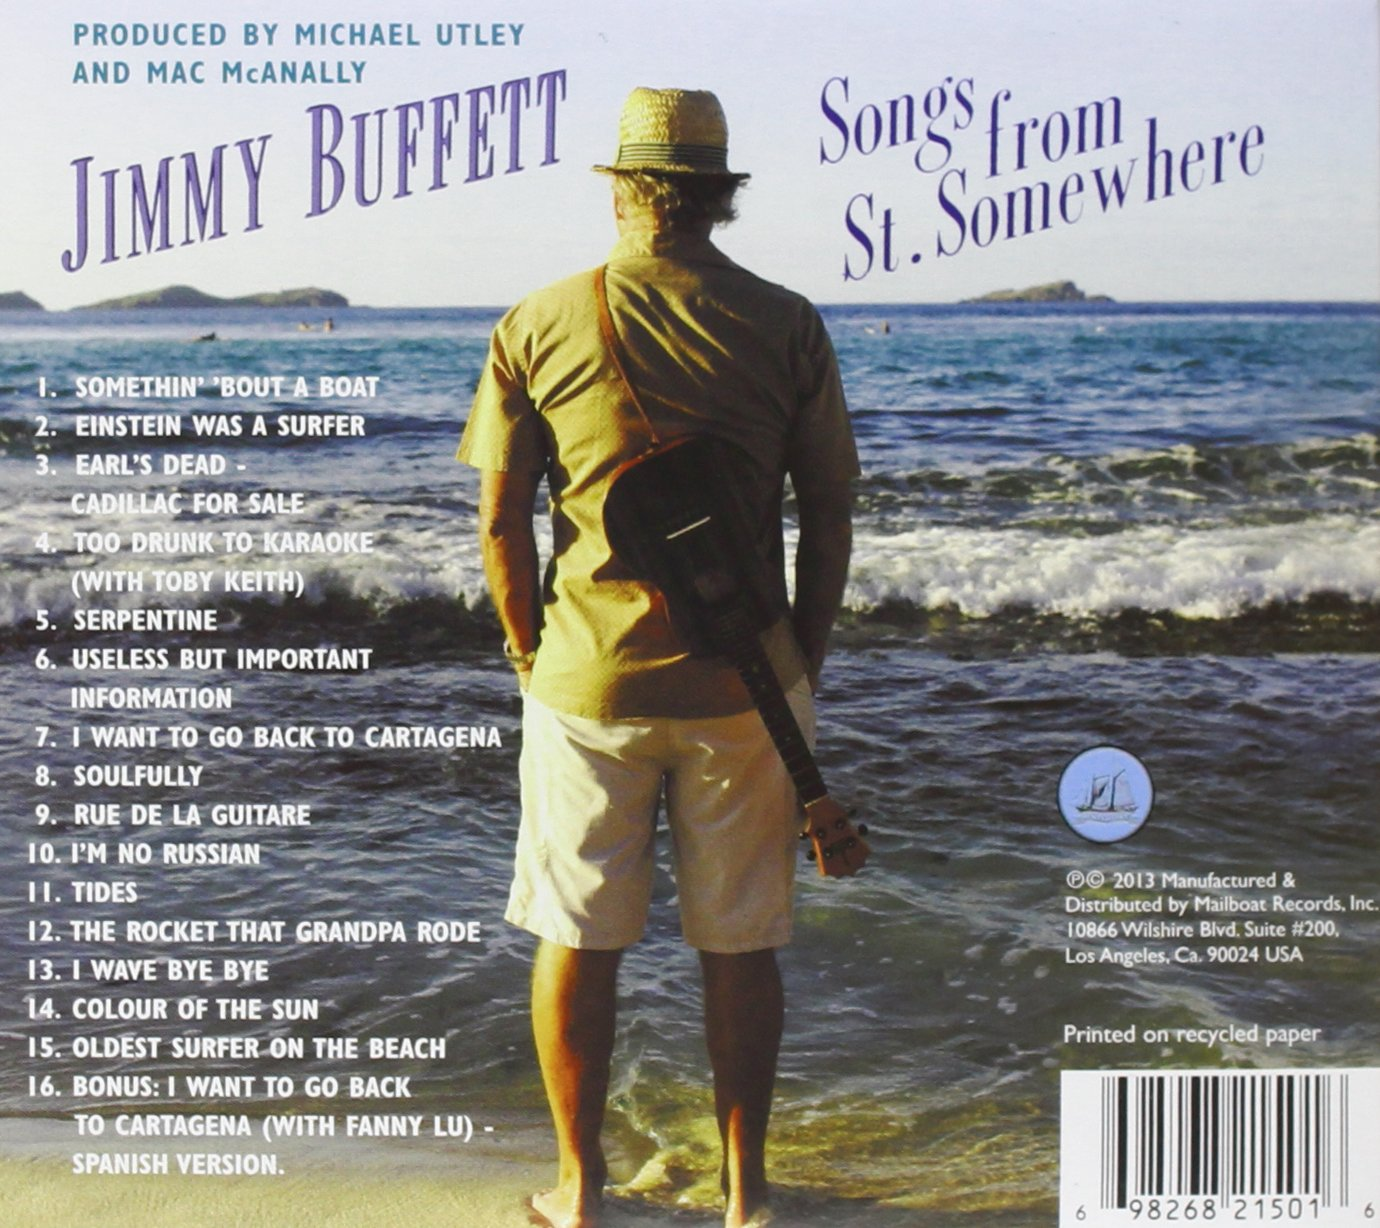 Jimmy 2013 Songs From St Somewhere Tour Double Sided Concert Handbill Buffett